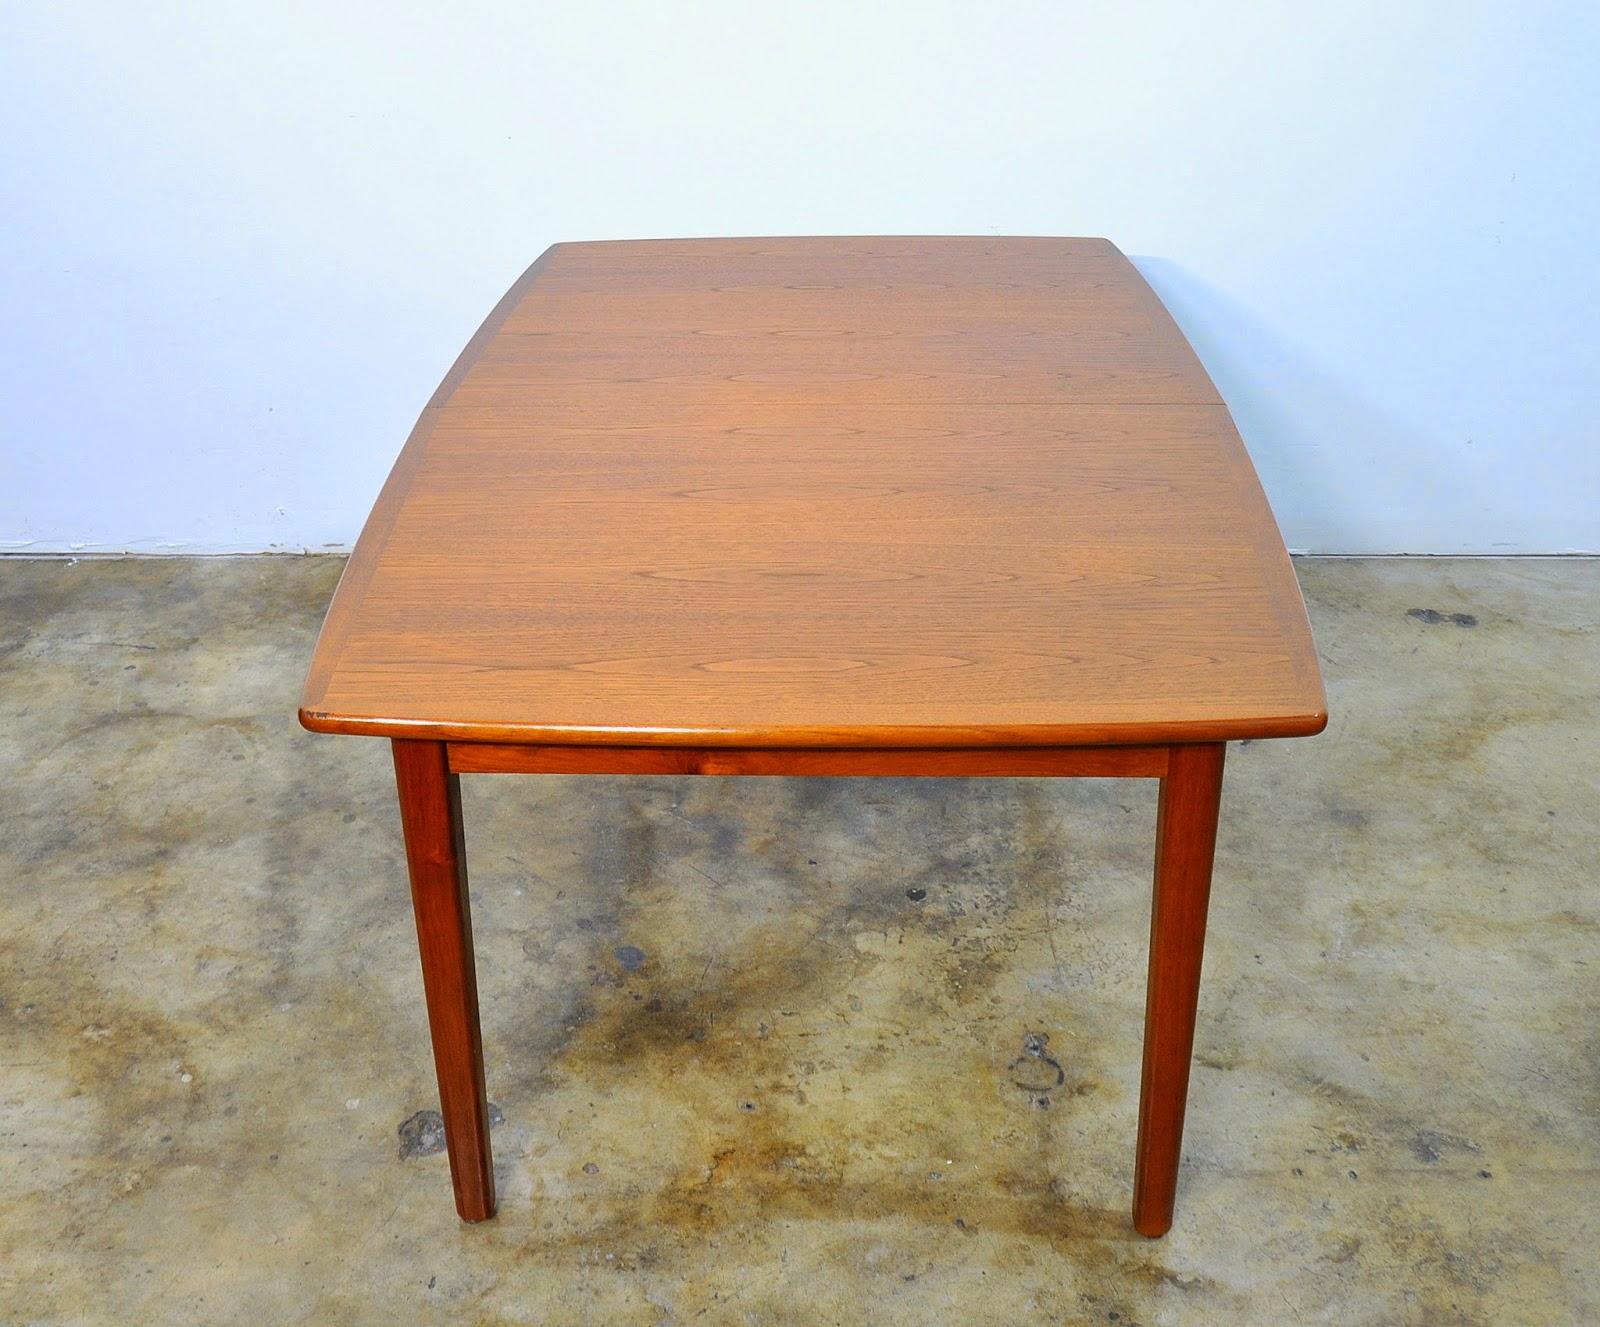 SELECT MODERN Falster Teak Expandable Dining Table : FalsterTeakDiningTable17 from midcenturymoderndesignfinds.blogspot.com size 1600 x 1327 jpeg 352kB